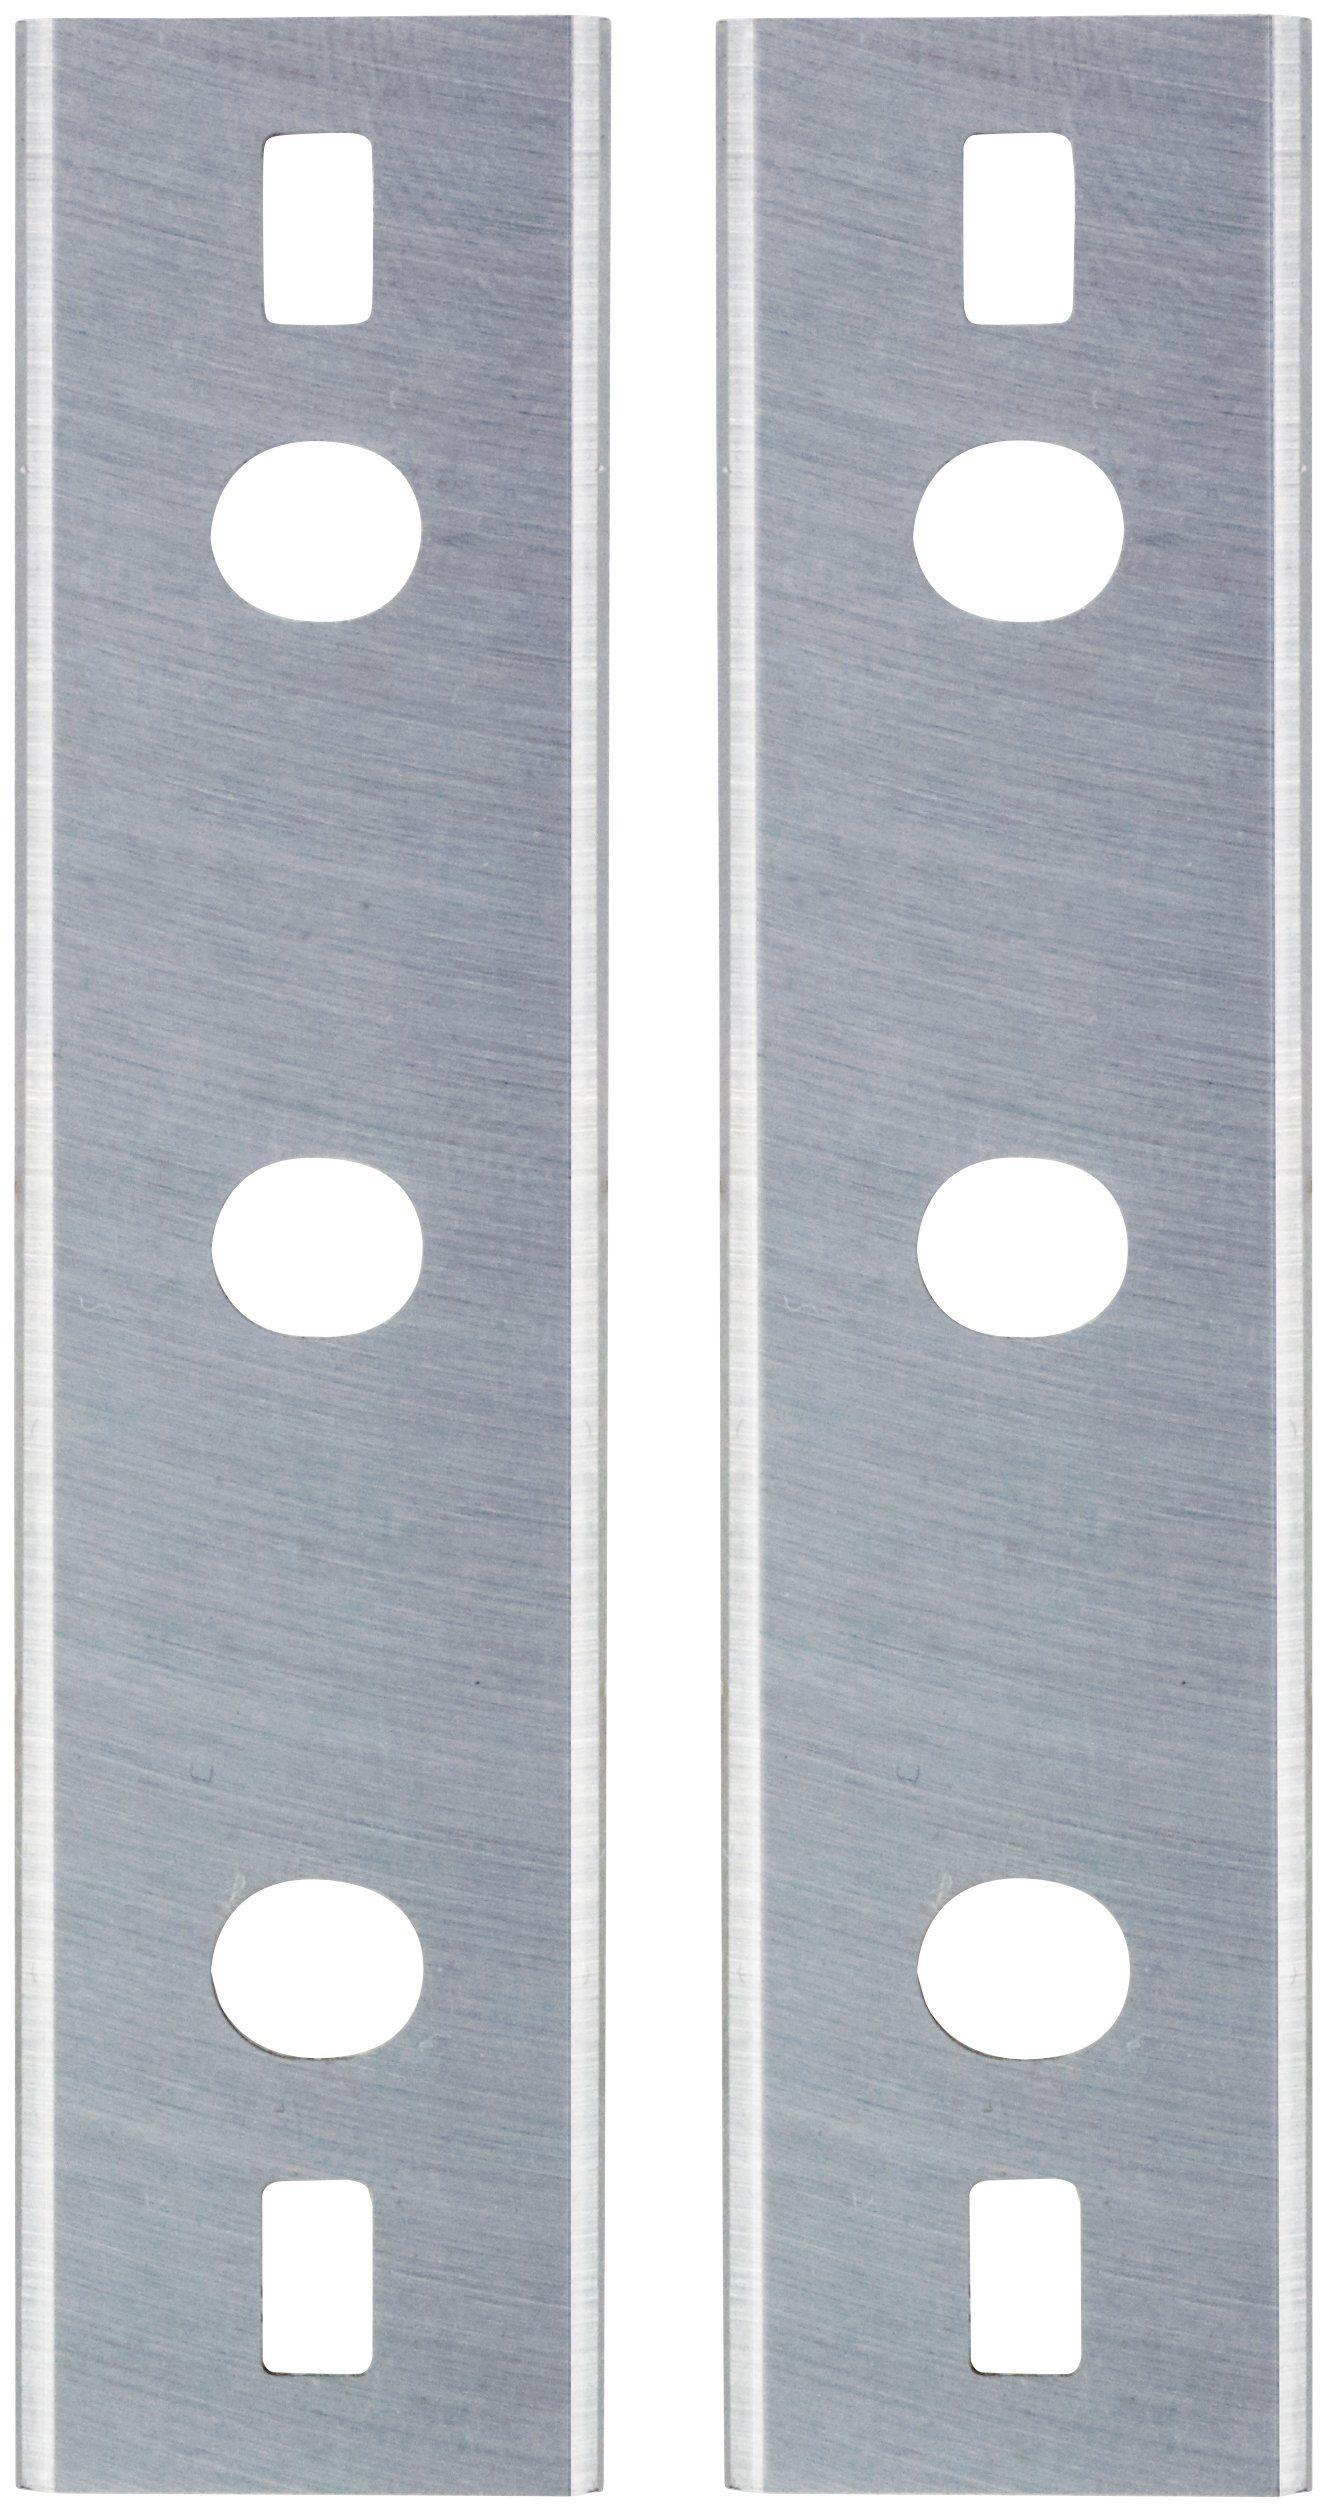 PROXXON Wendehobelmesser »für AH 80 Abrichthobel«, 2 Stück